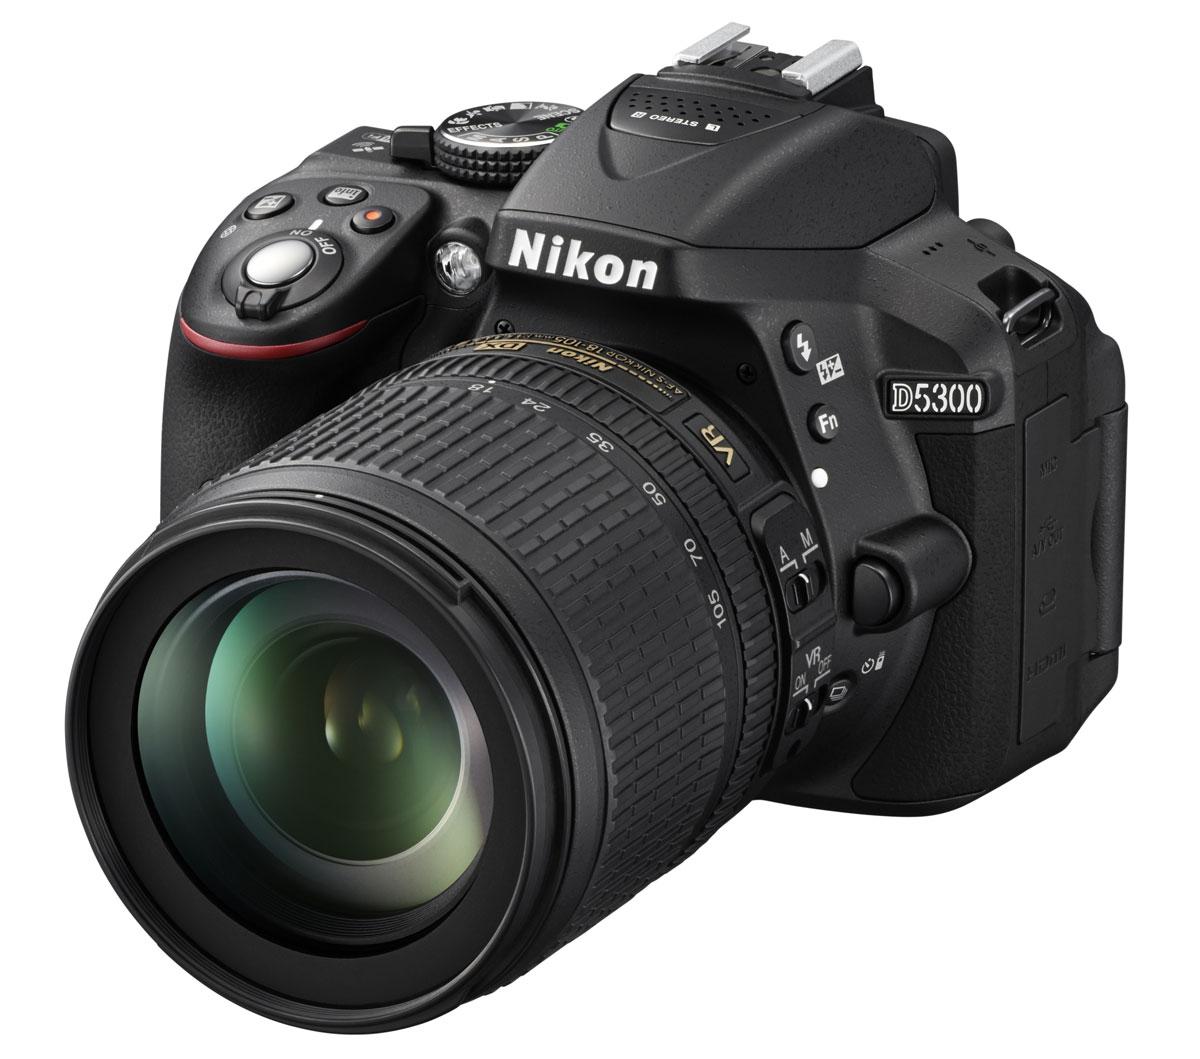 Zakazat.ru Nikon D5300 Kit 18-105 VR, Black цифровая зеркальная фотокамера